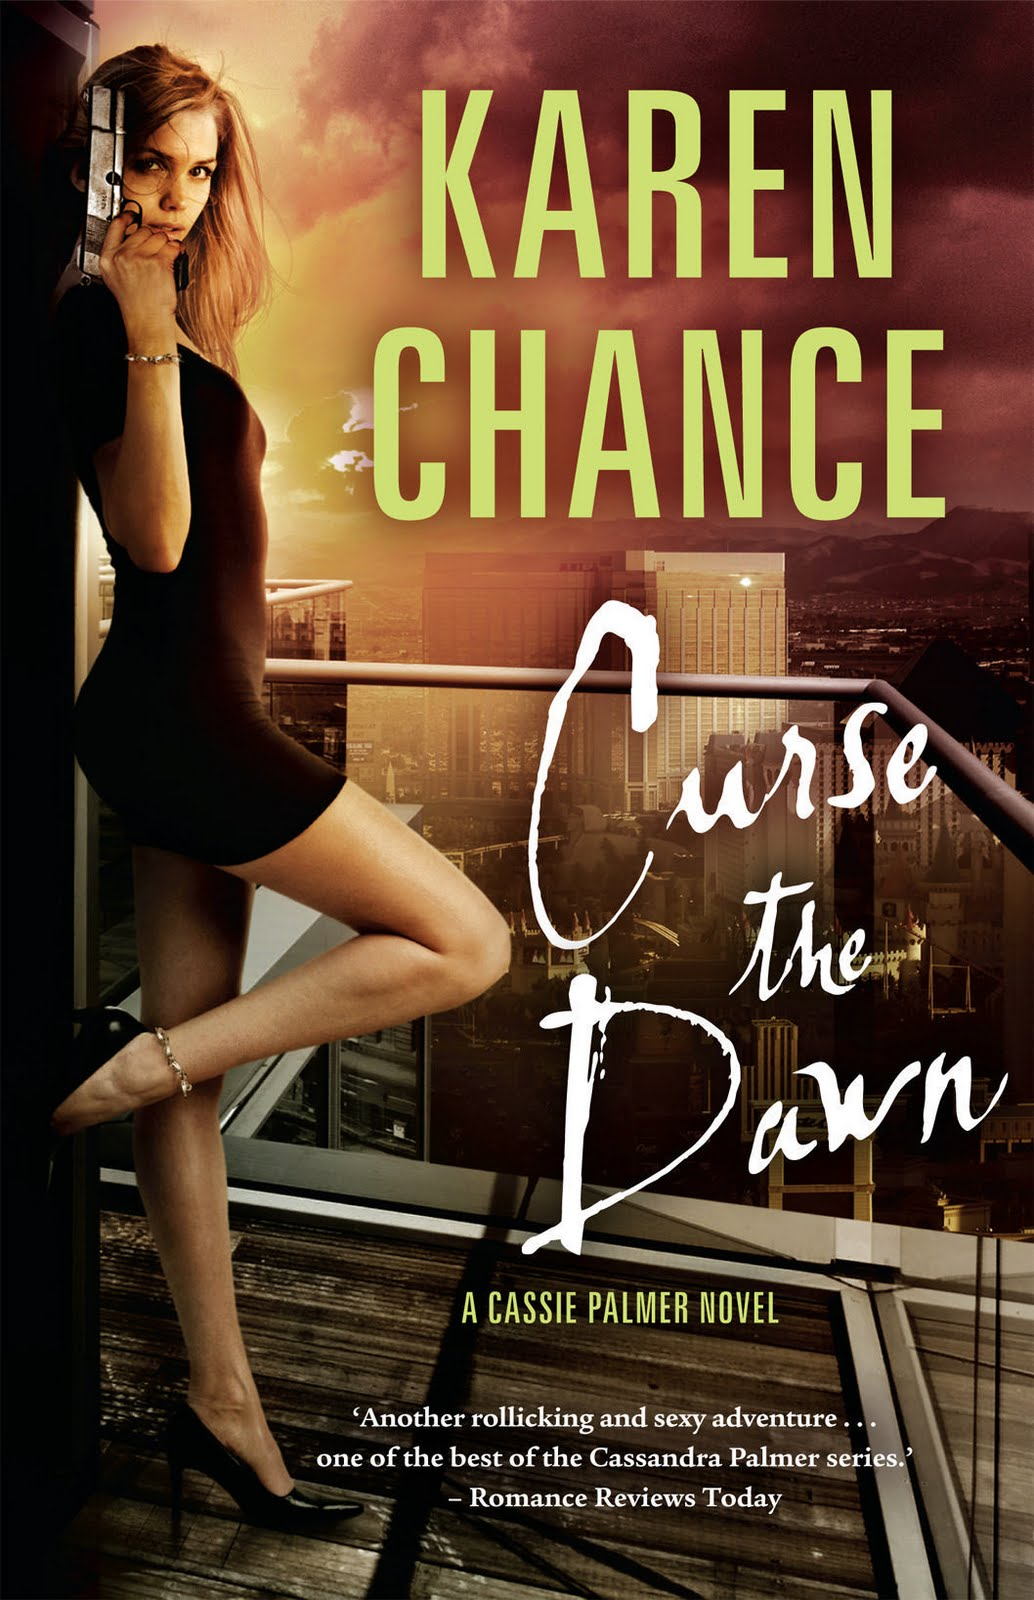 Review: Curse the Dawn by Karen Chance